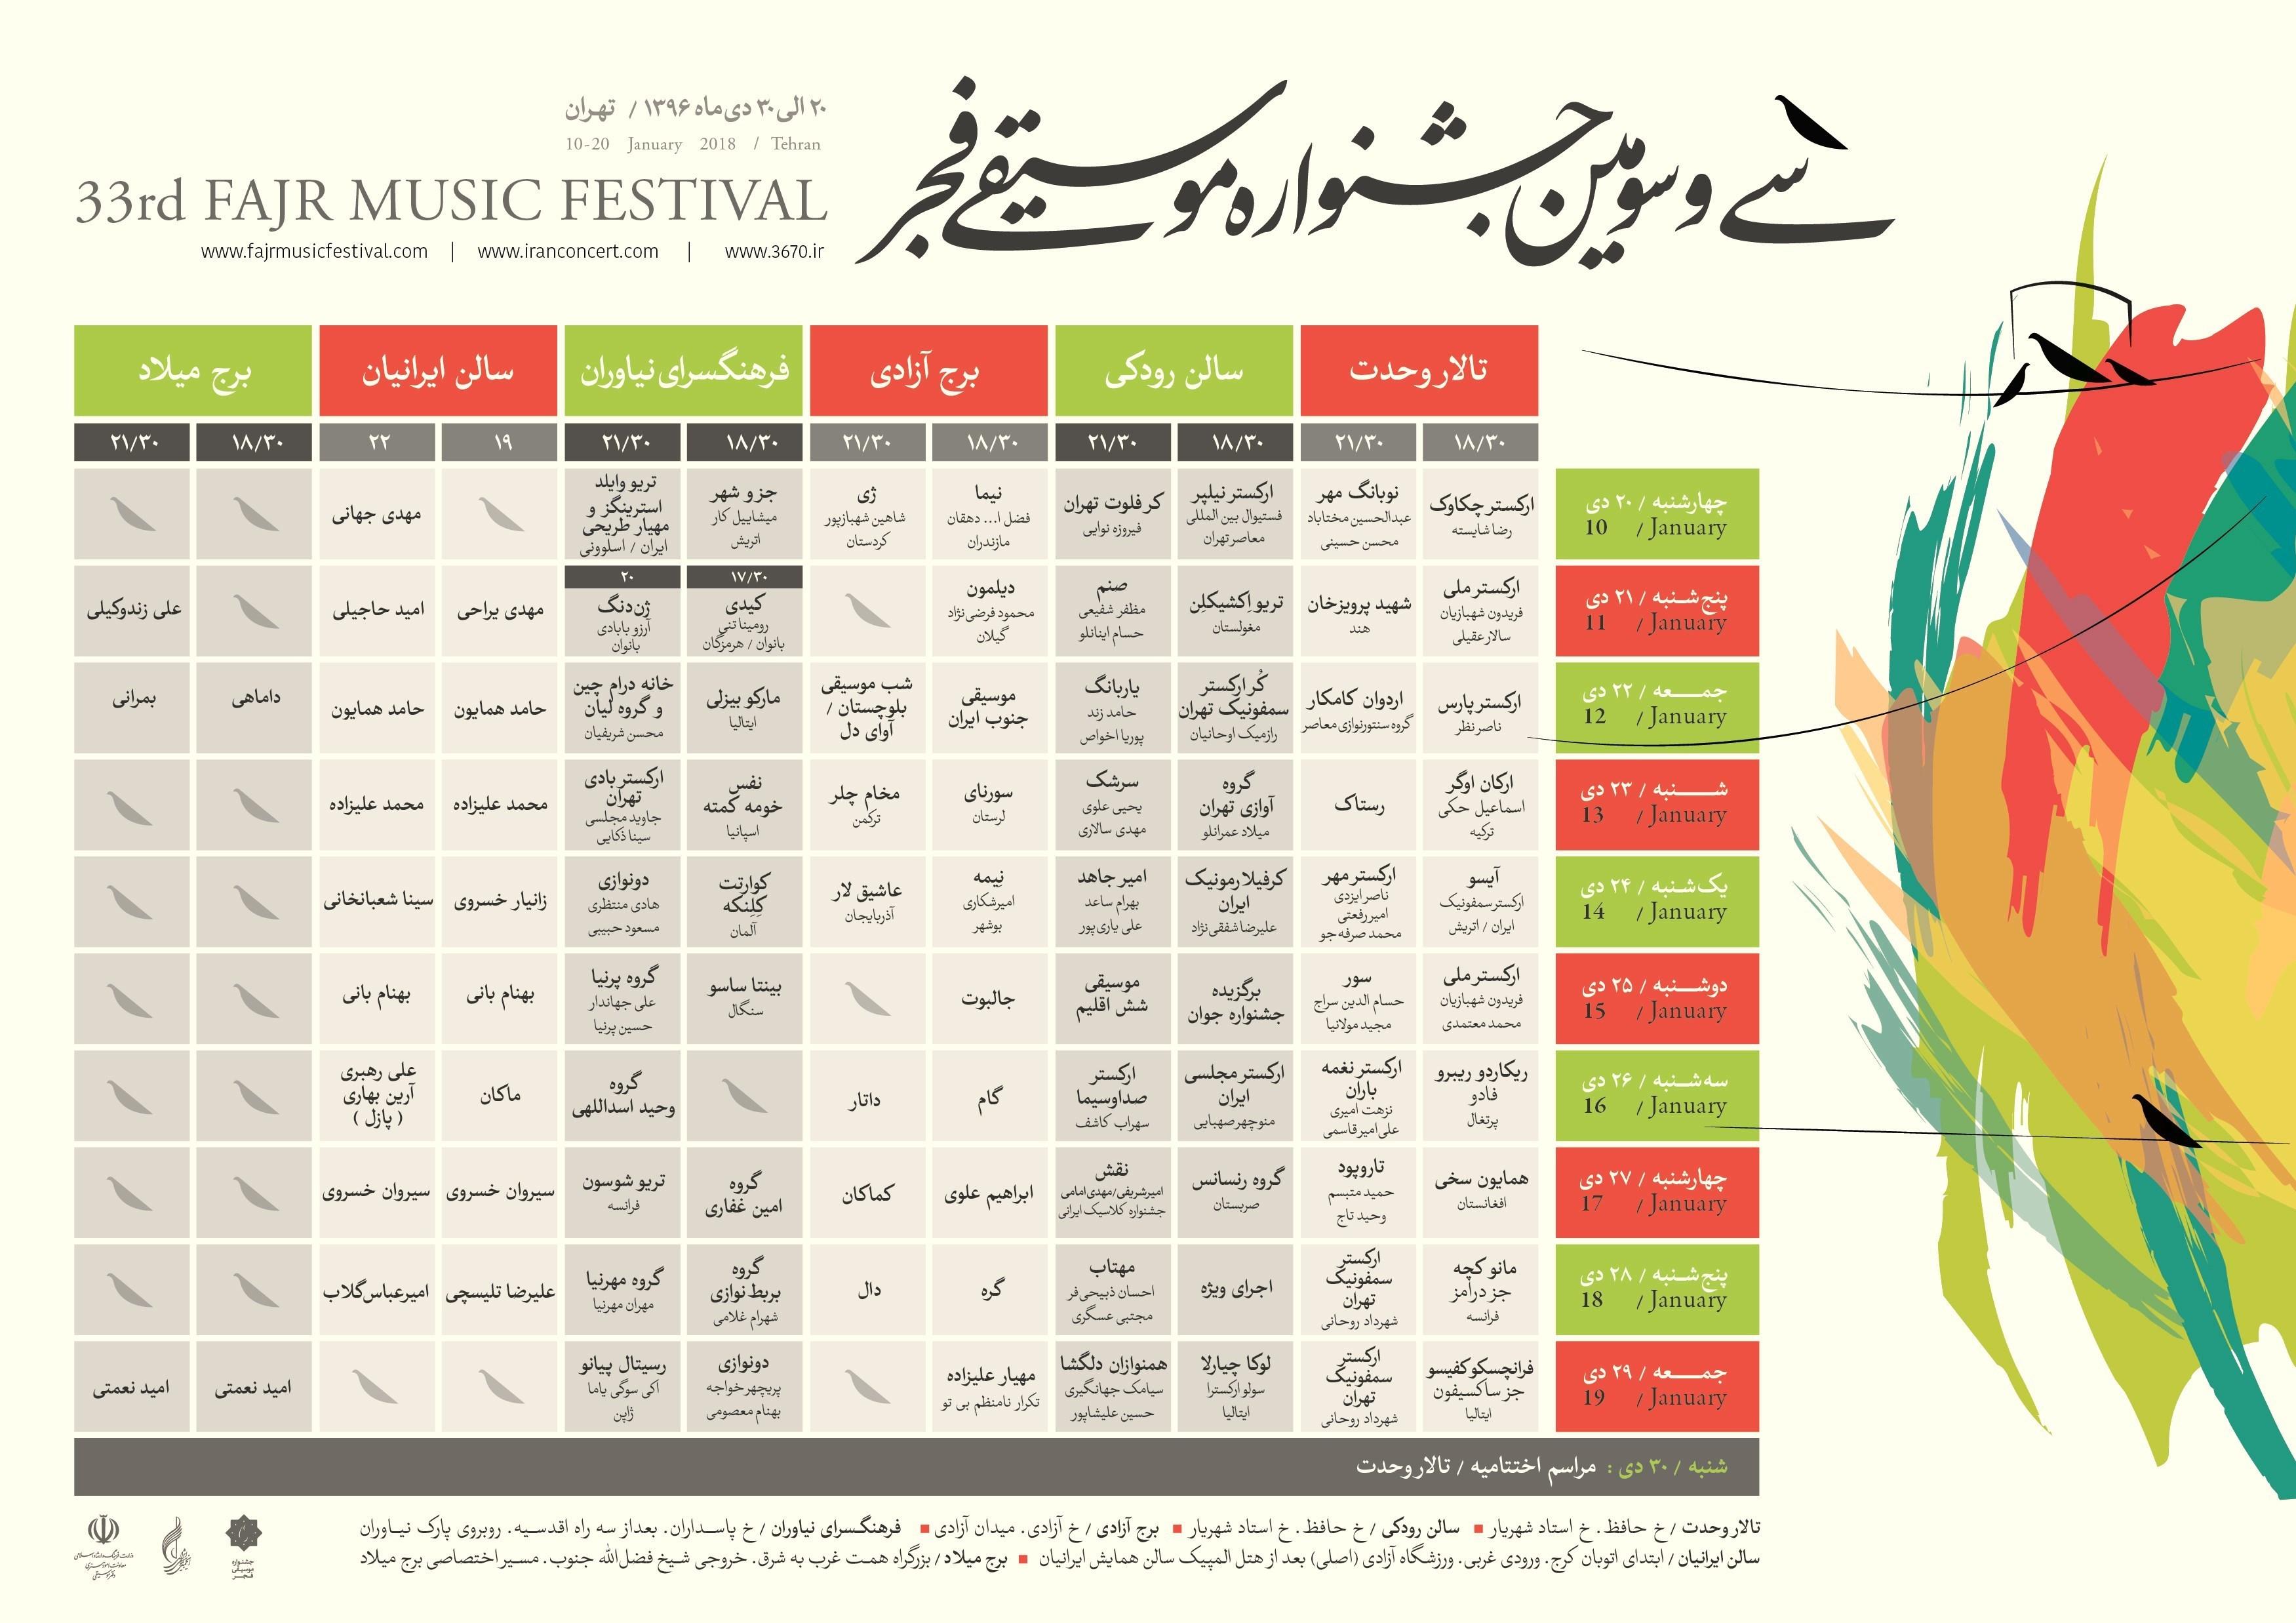 جشنواره فجر موسیقی